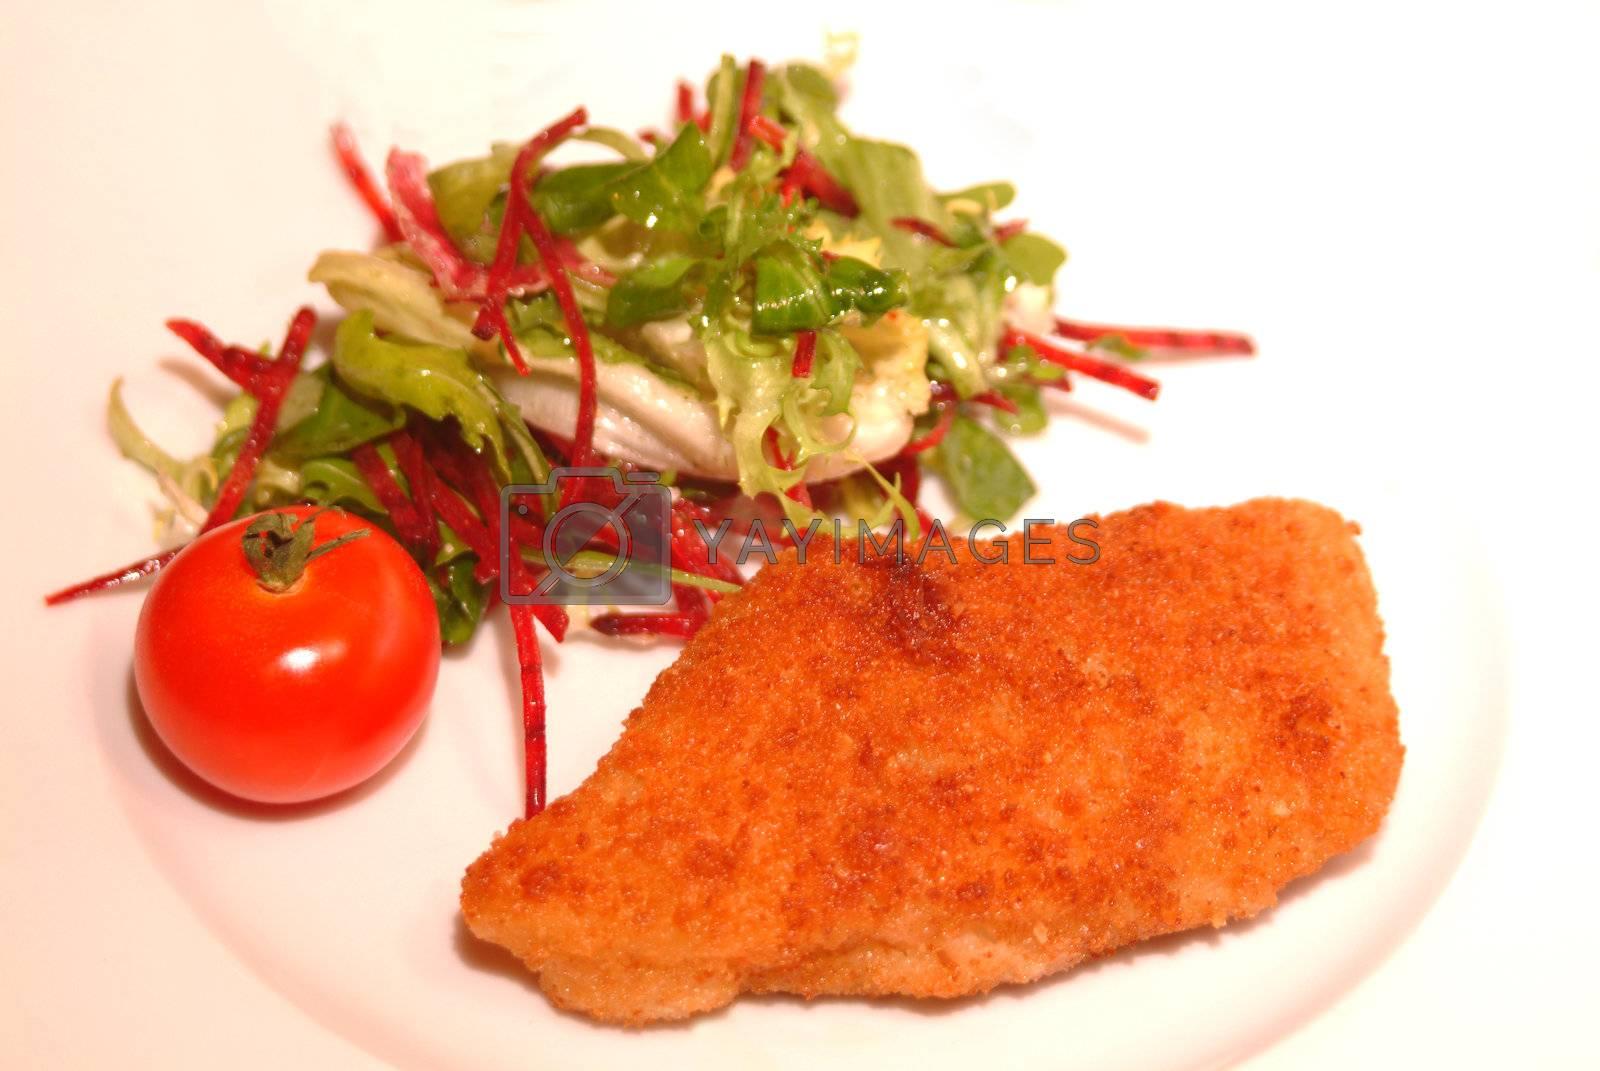 fish filet with fresh salad by Szakaly